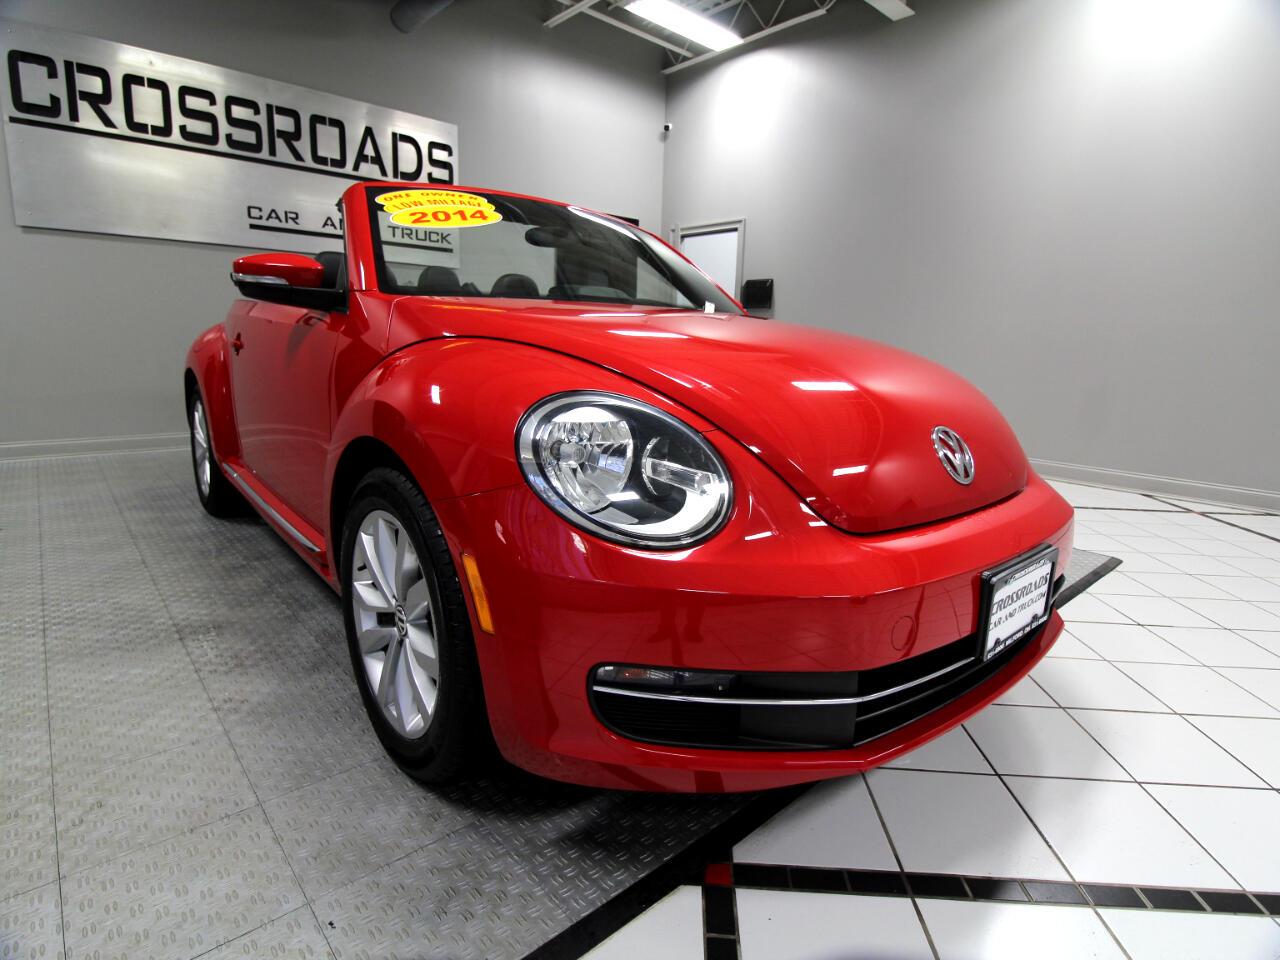 Volkswagen Beetle Convertible 2dr DSG 2.0L TDI 2014